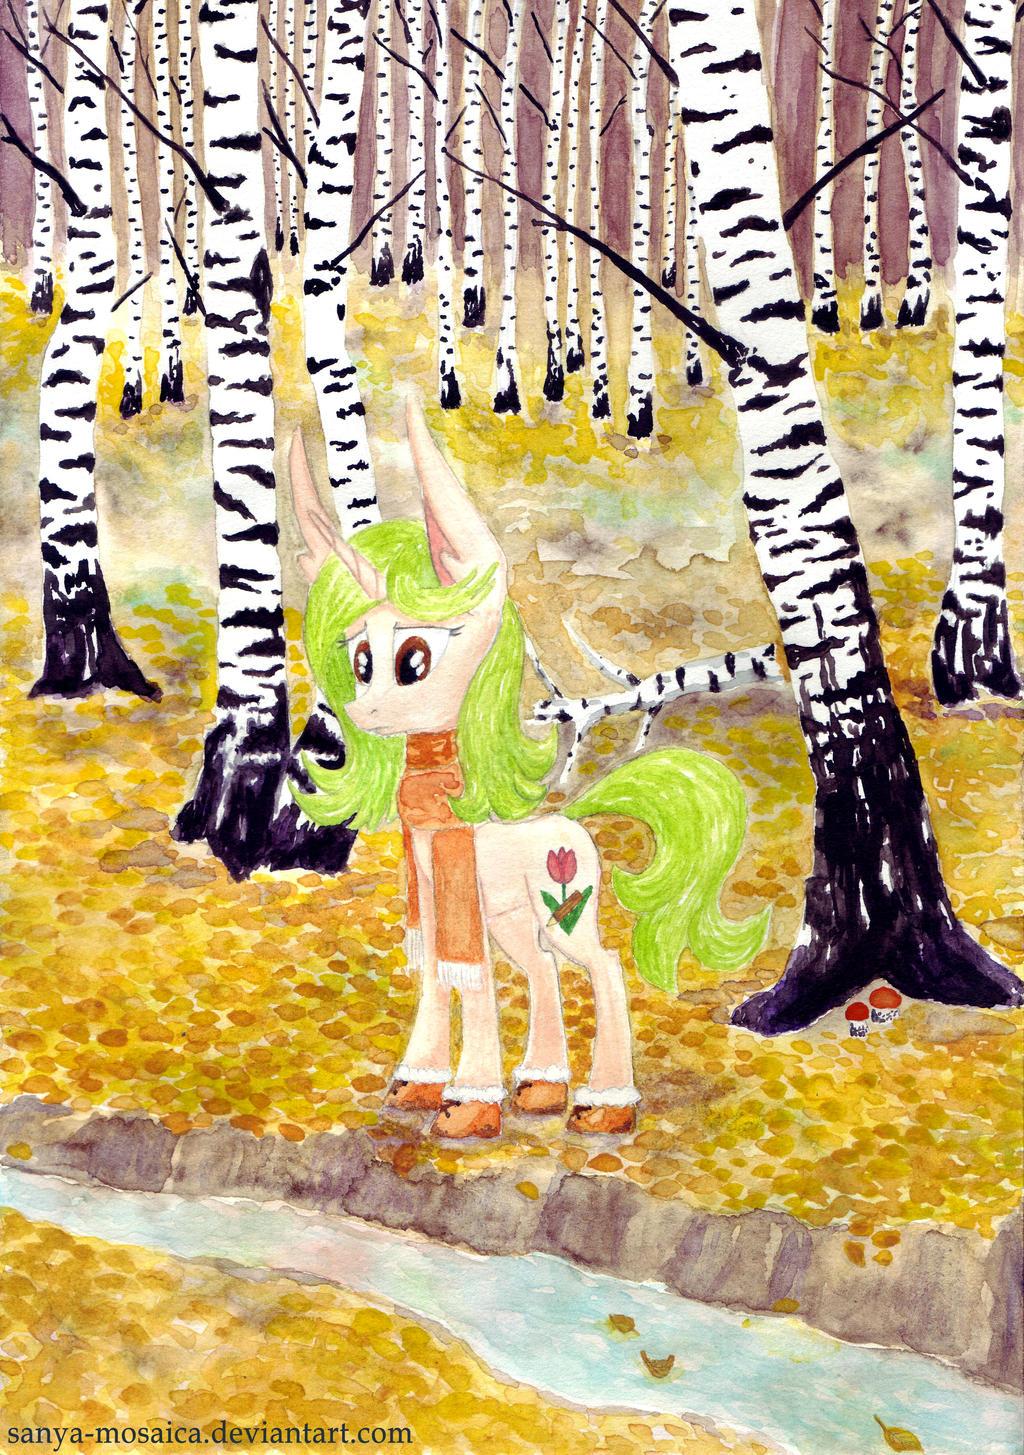 Sanya-Mosaica's Profile Picture